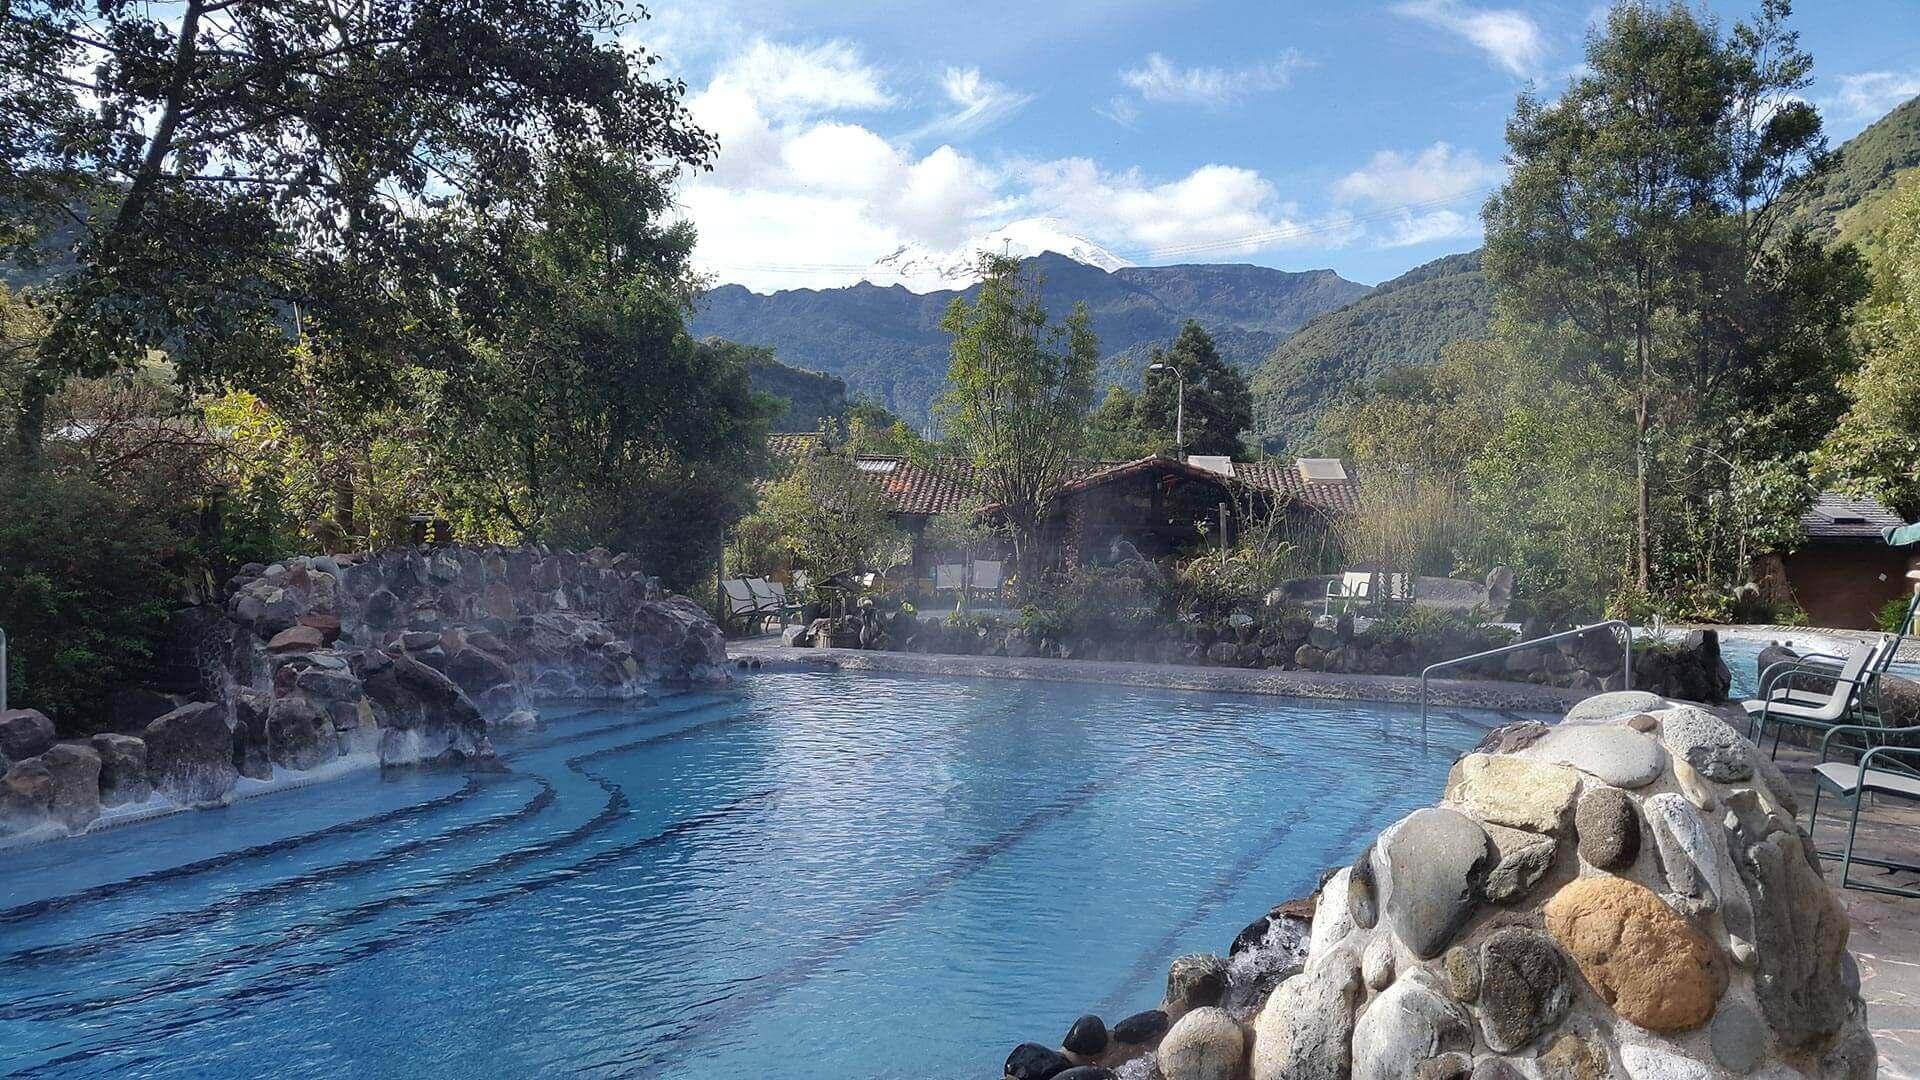 papallacta hot springs pool